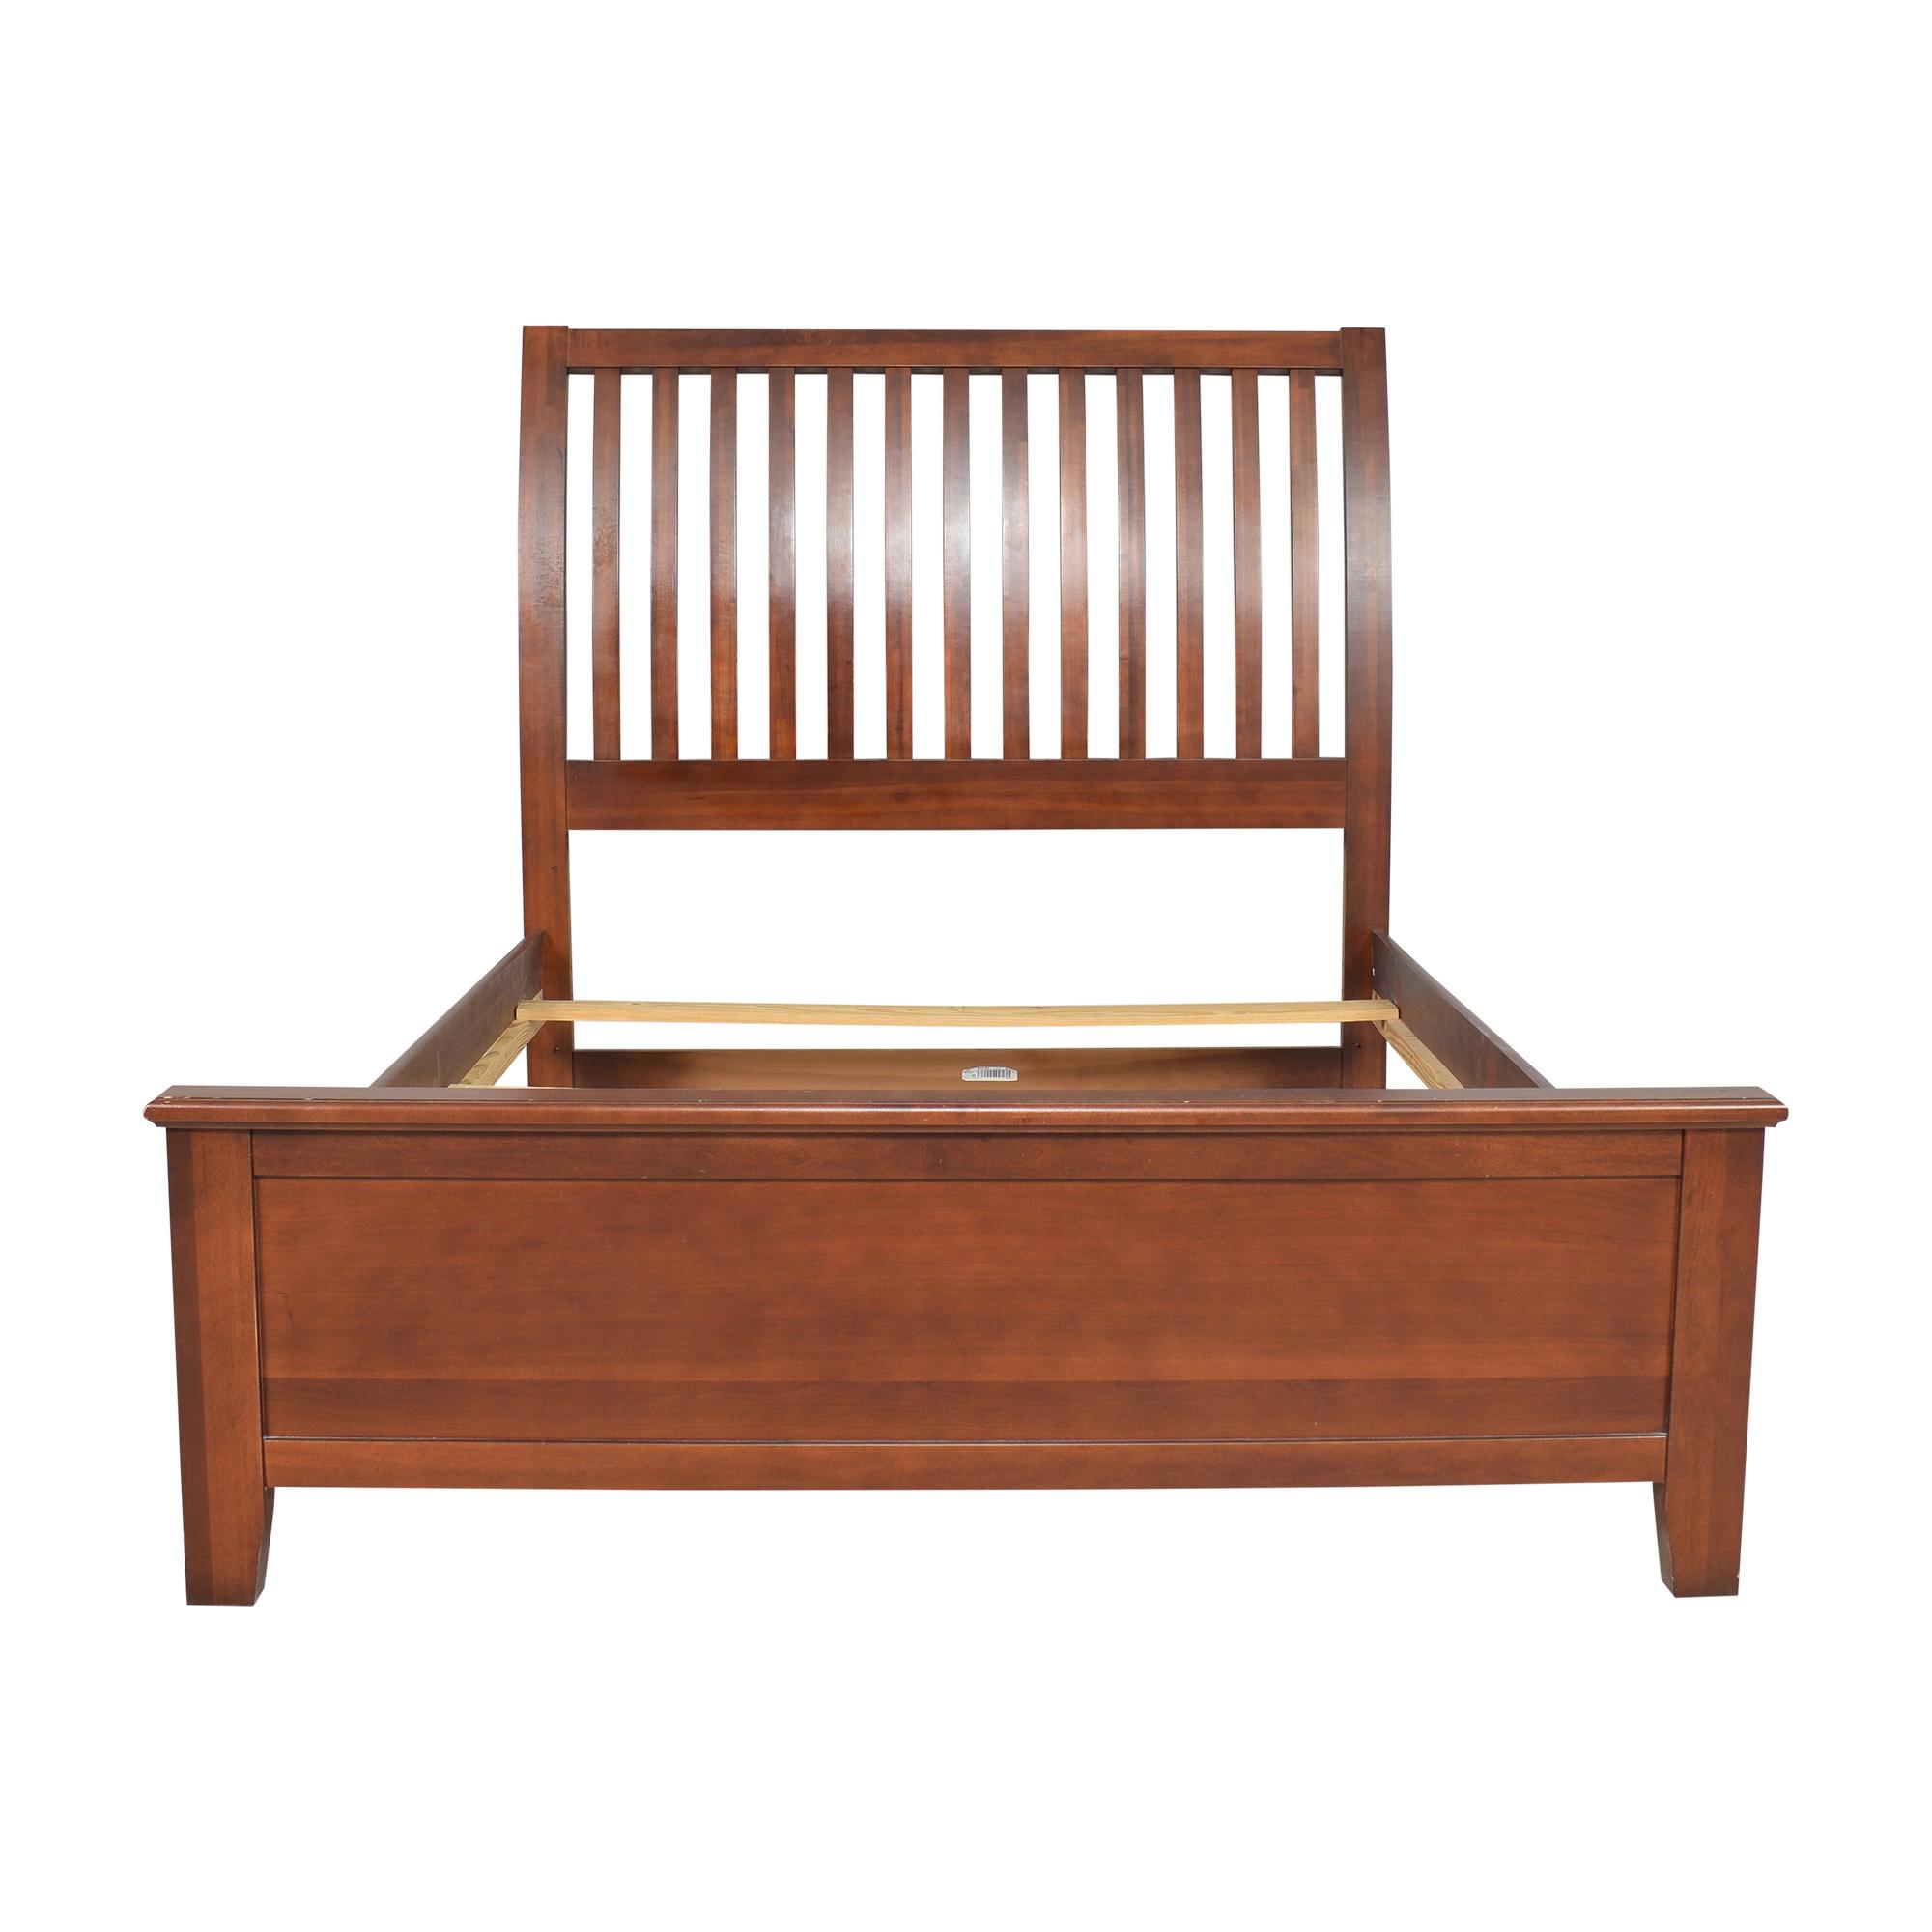 Vaughan-Bassett Queen Slat Bed / Beds